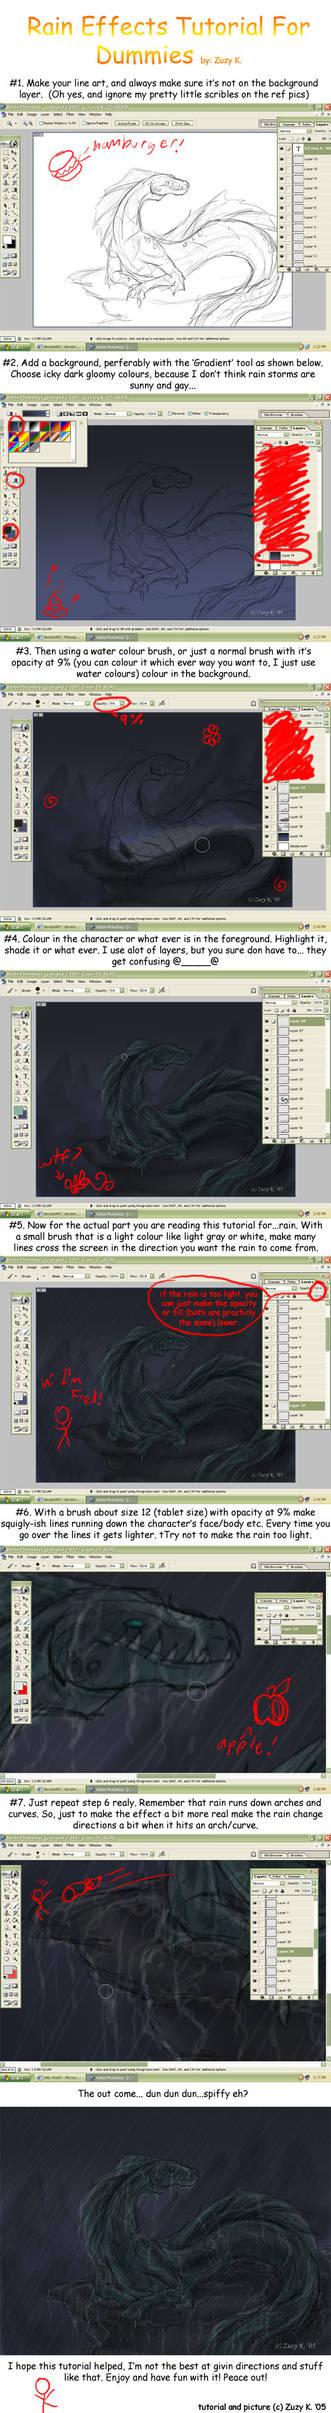 .:rain effects tutorial:.